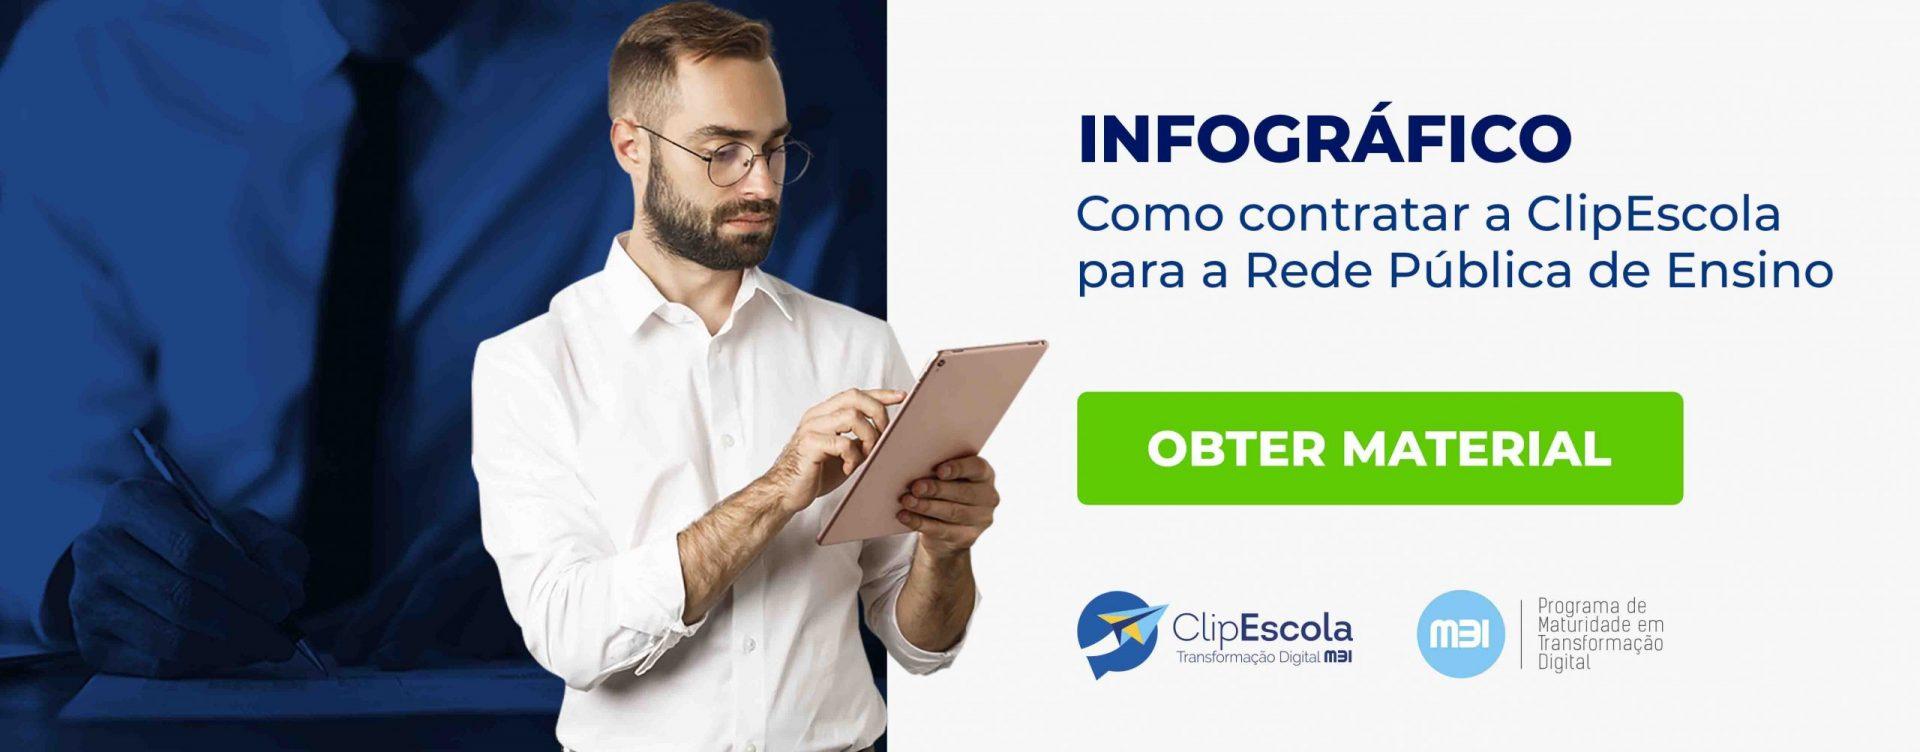 CTA_Infográfico - Como contratar a ClipEscola para a rede pública de ensino